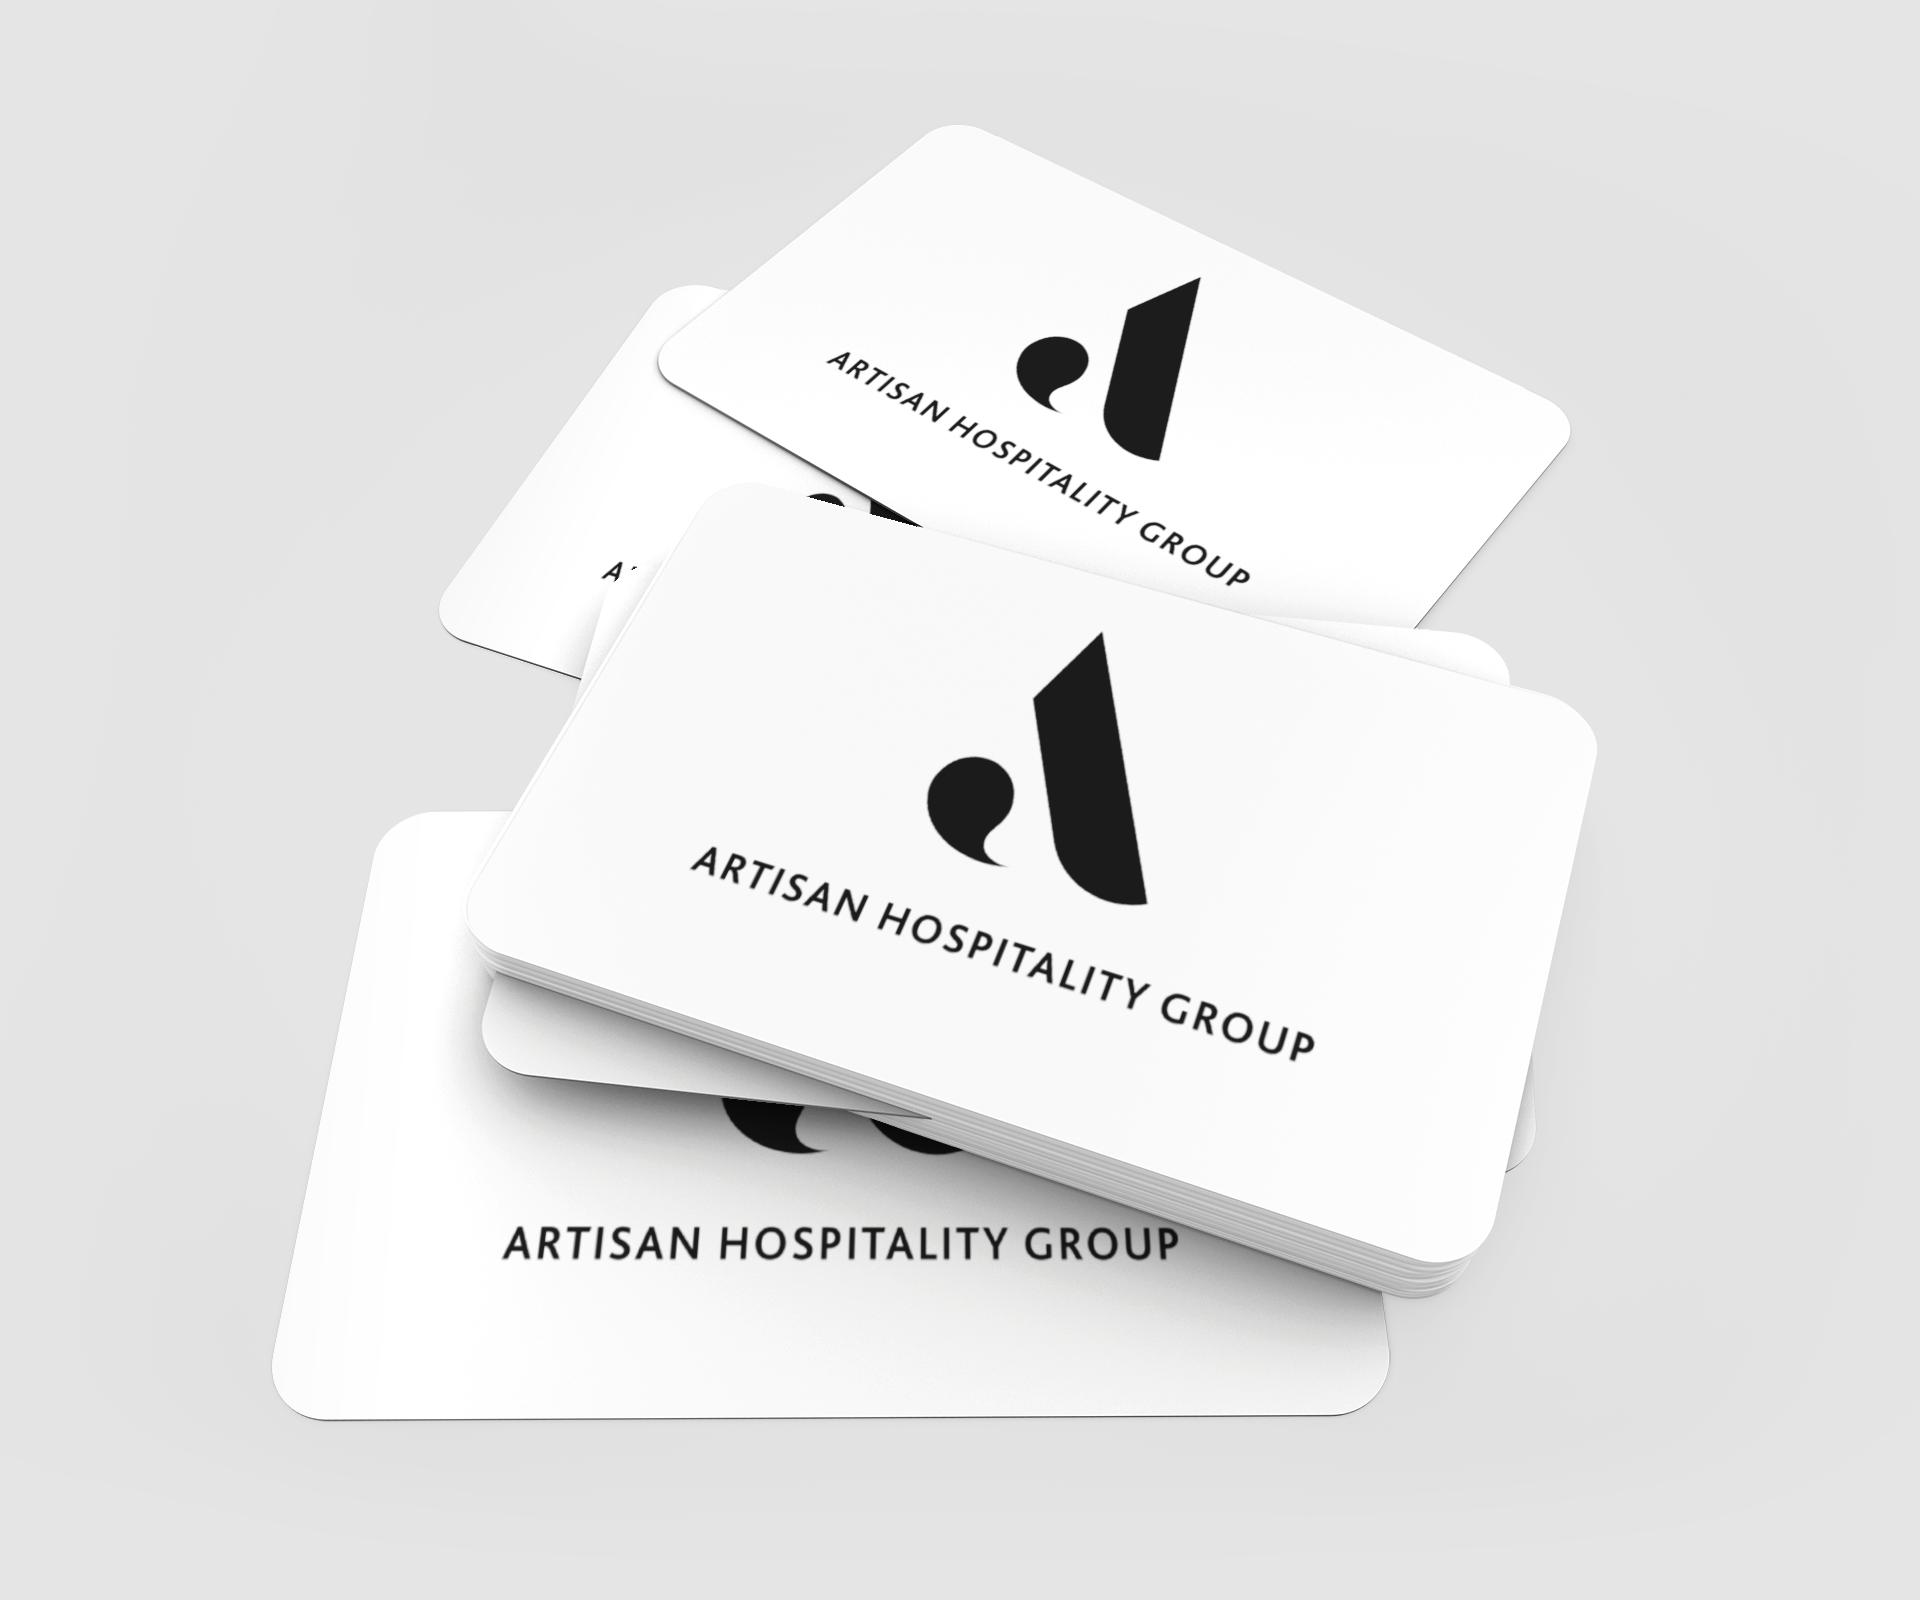 Artisan Hospitality Group branding